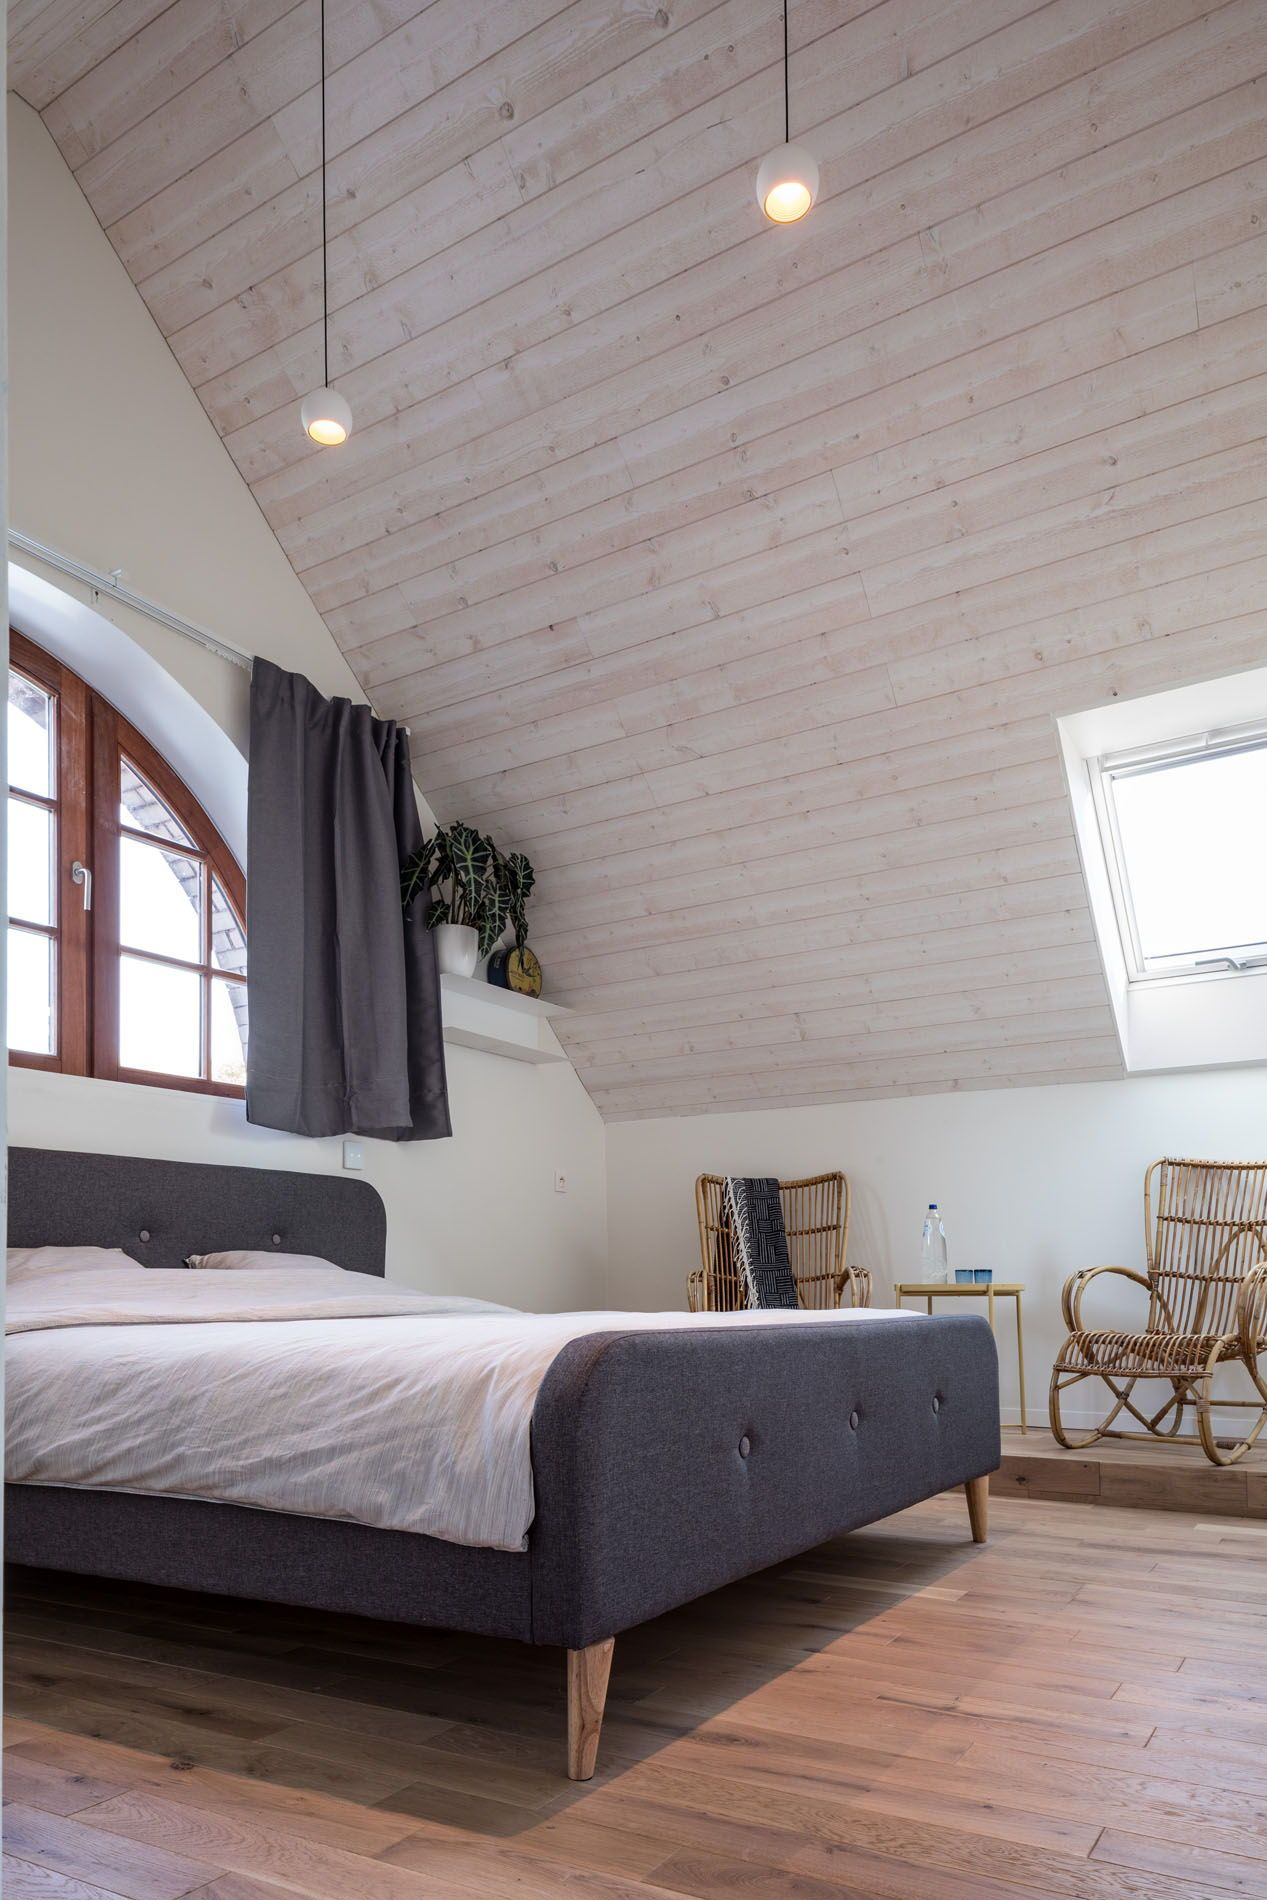 Track Light Bedroom Ceiling Lights Ideas Decolover Net Bedroom